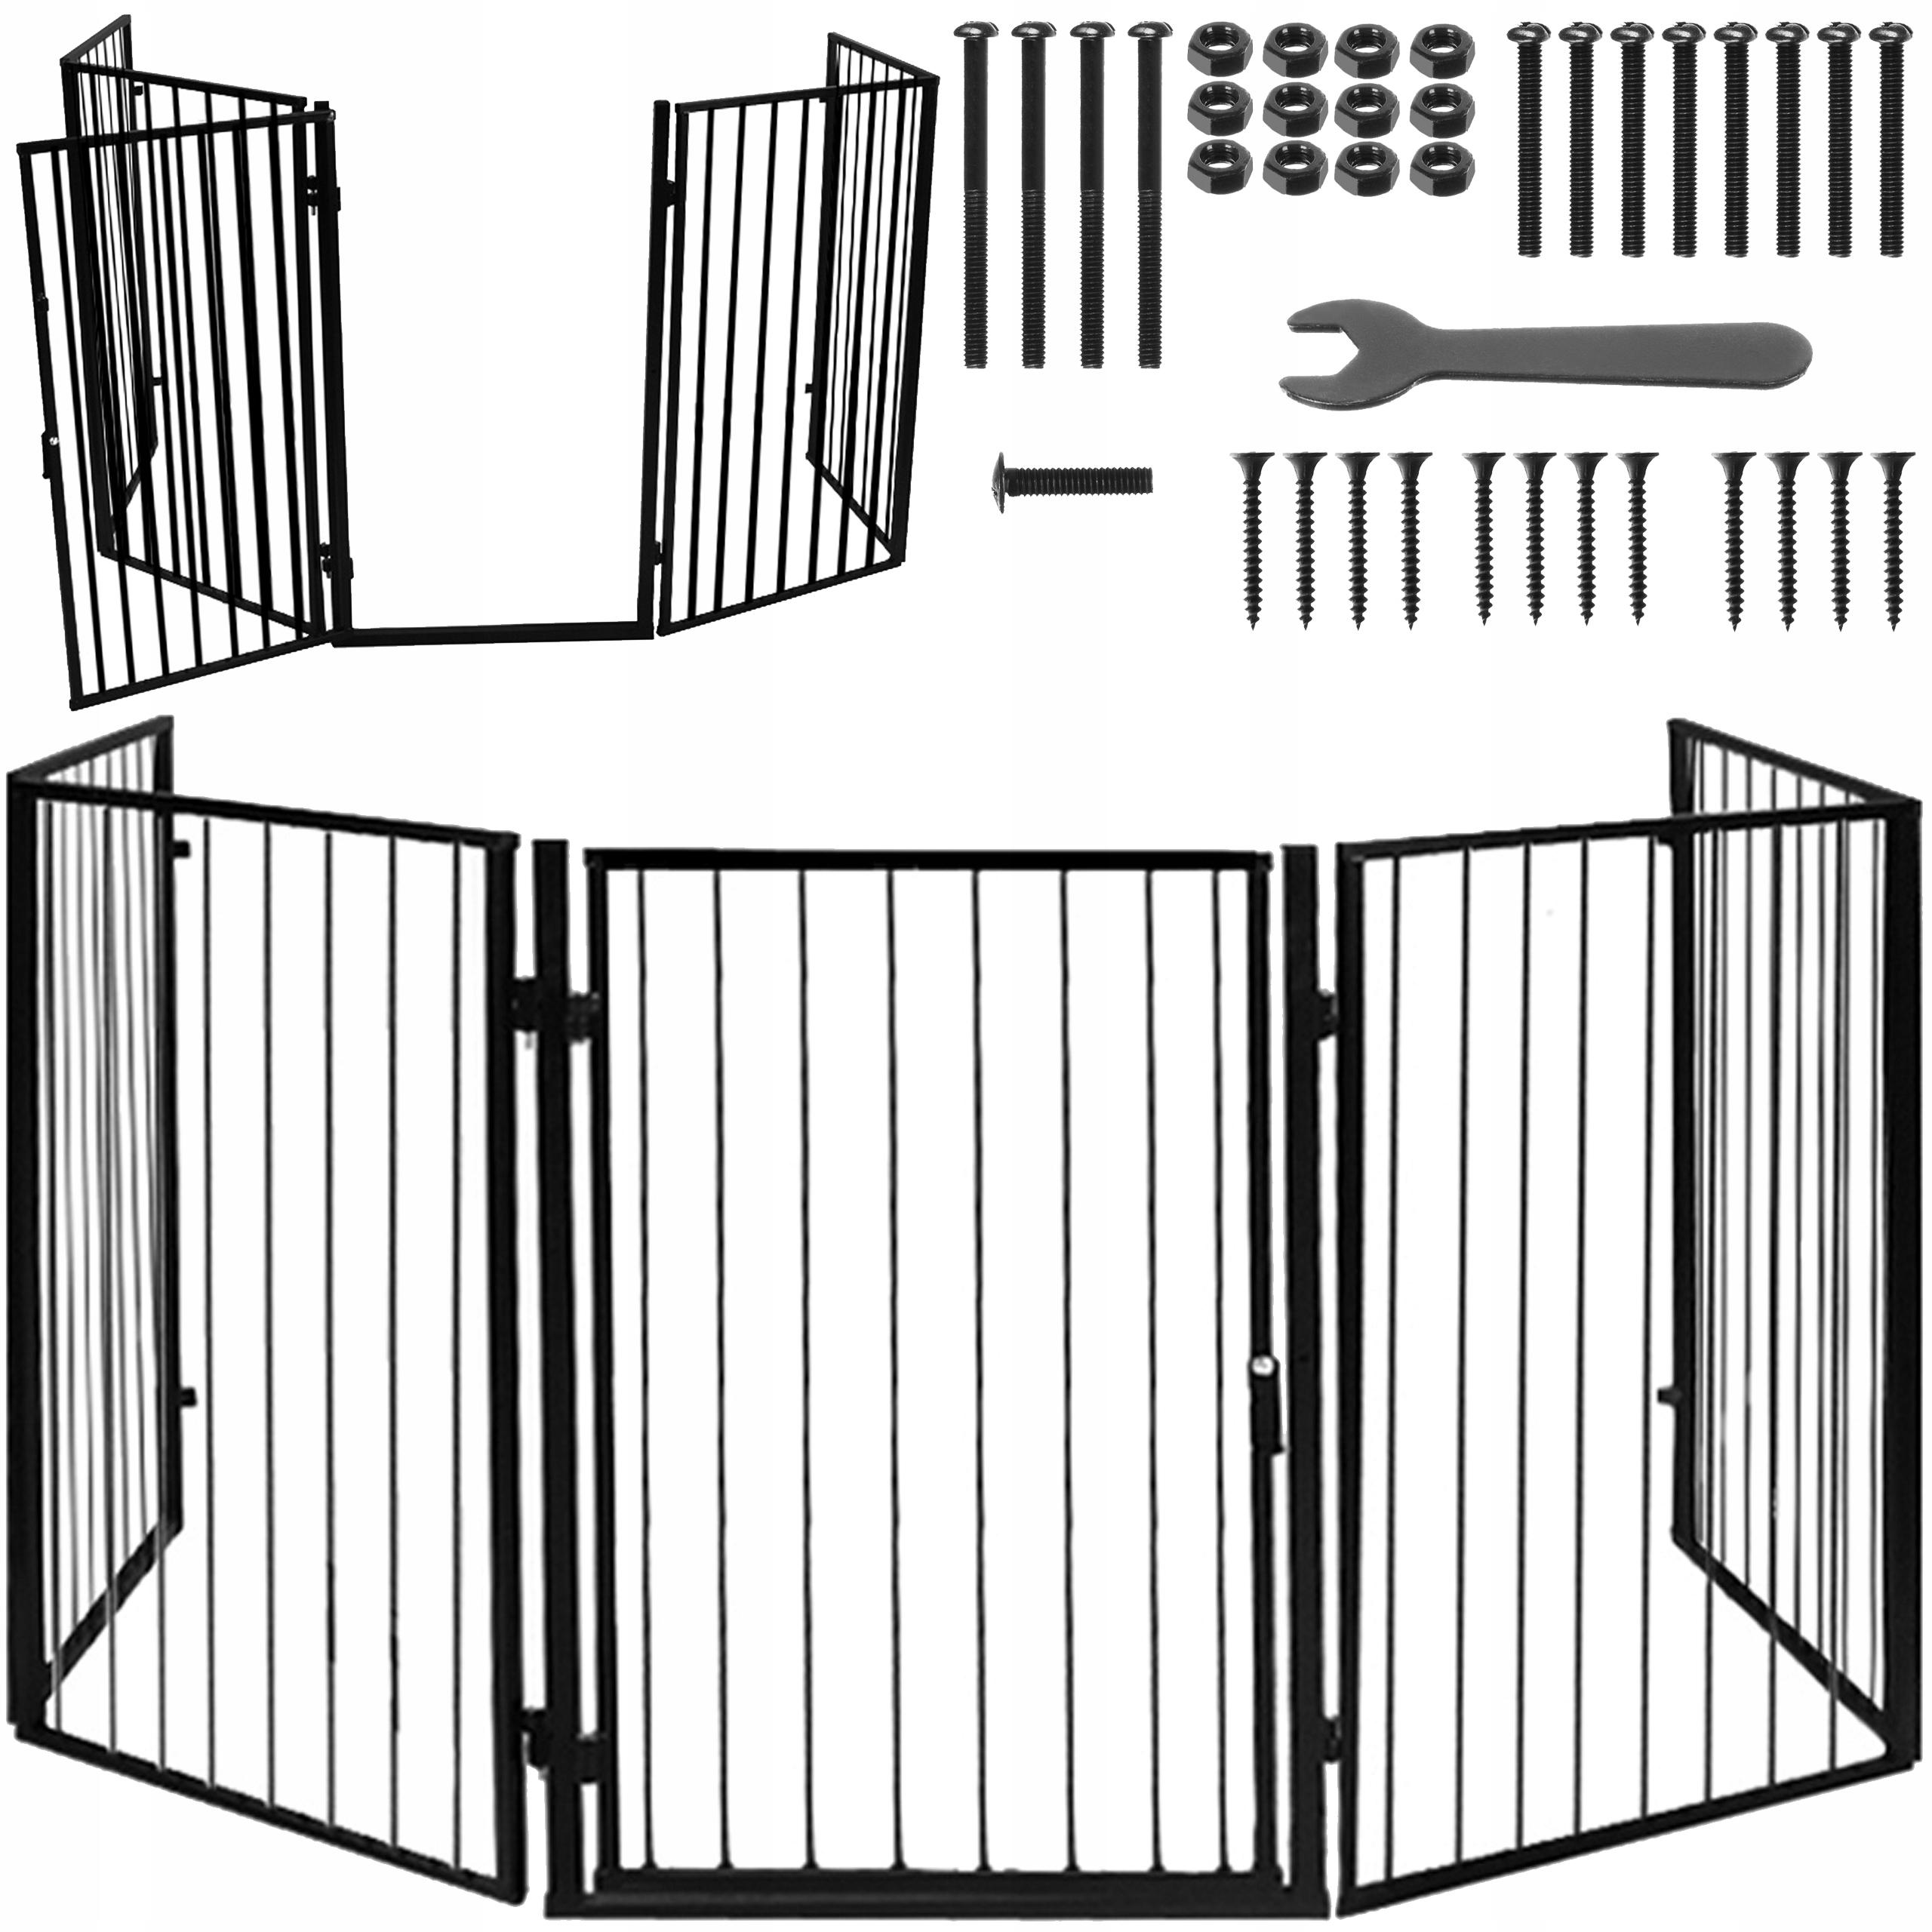 Крышка камина барьера безопасности ворот